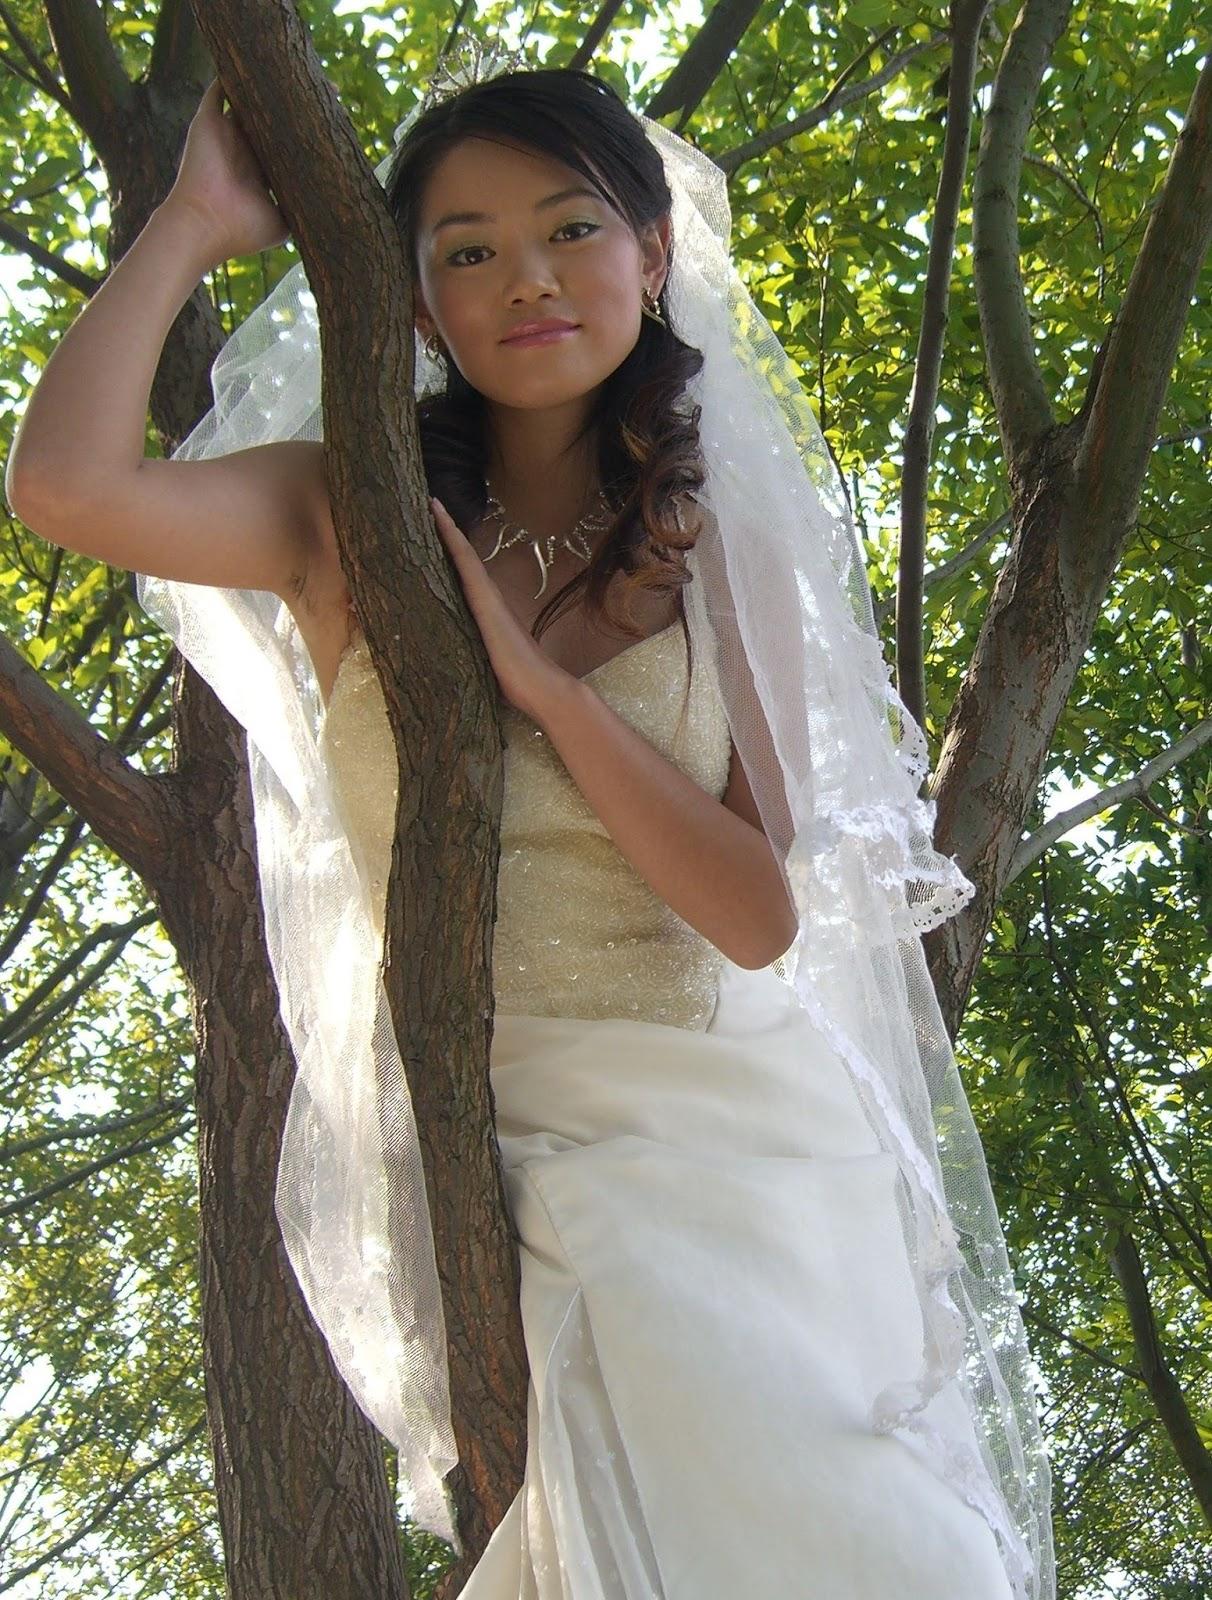 Amy yasbeck nude in robin hood men in tights